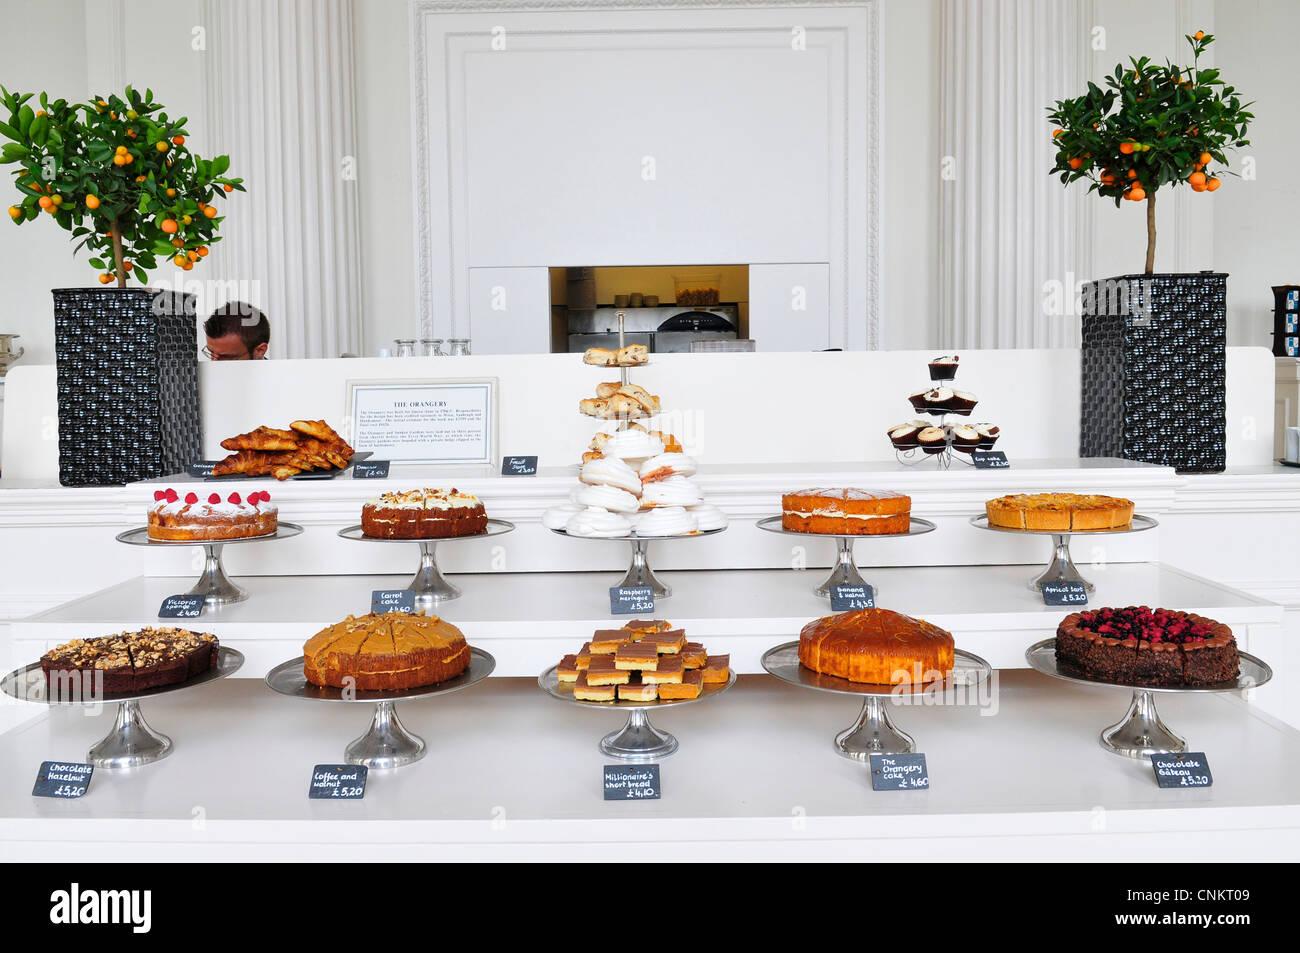 A Display of Cakes at The Orangery, Kensington Palace, London, England, UK - Stock Image